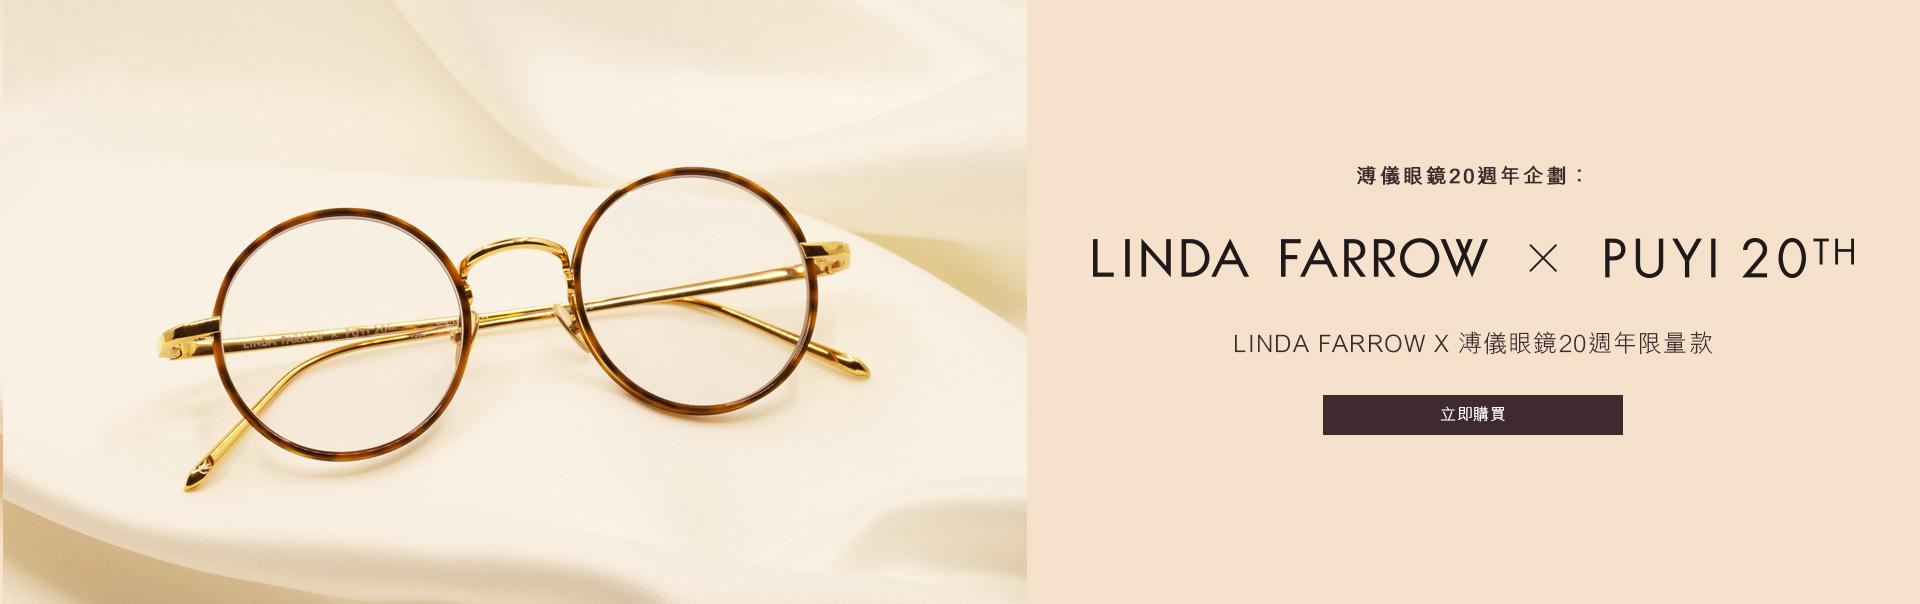 Linda Farrow X PUYI 20TH LIMITED EDITION